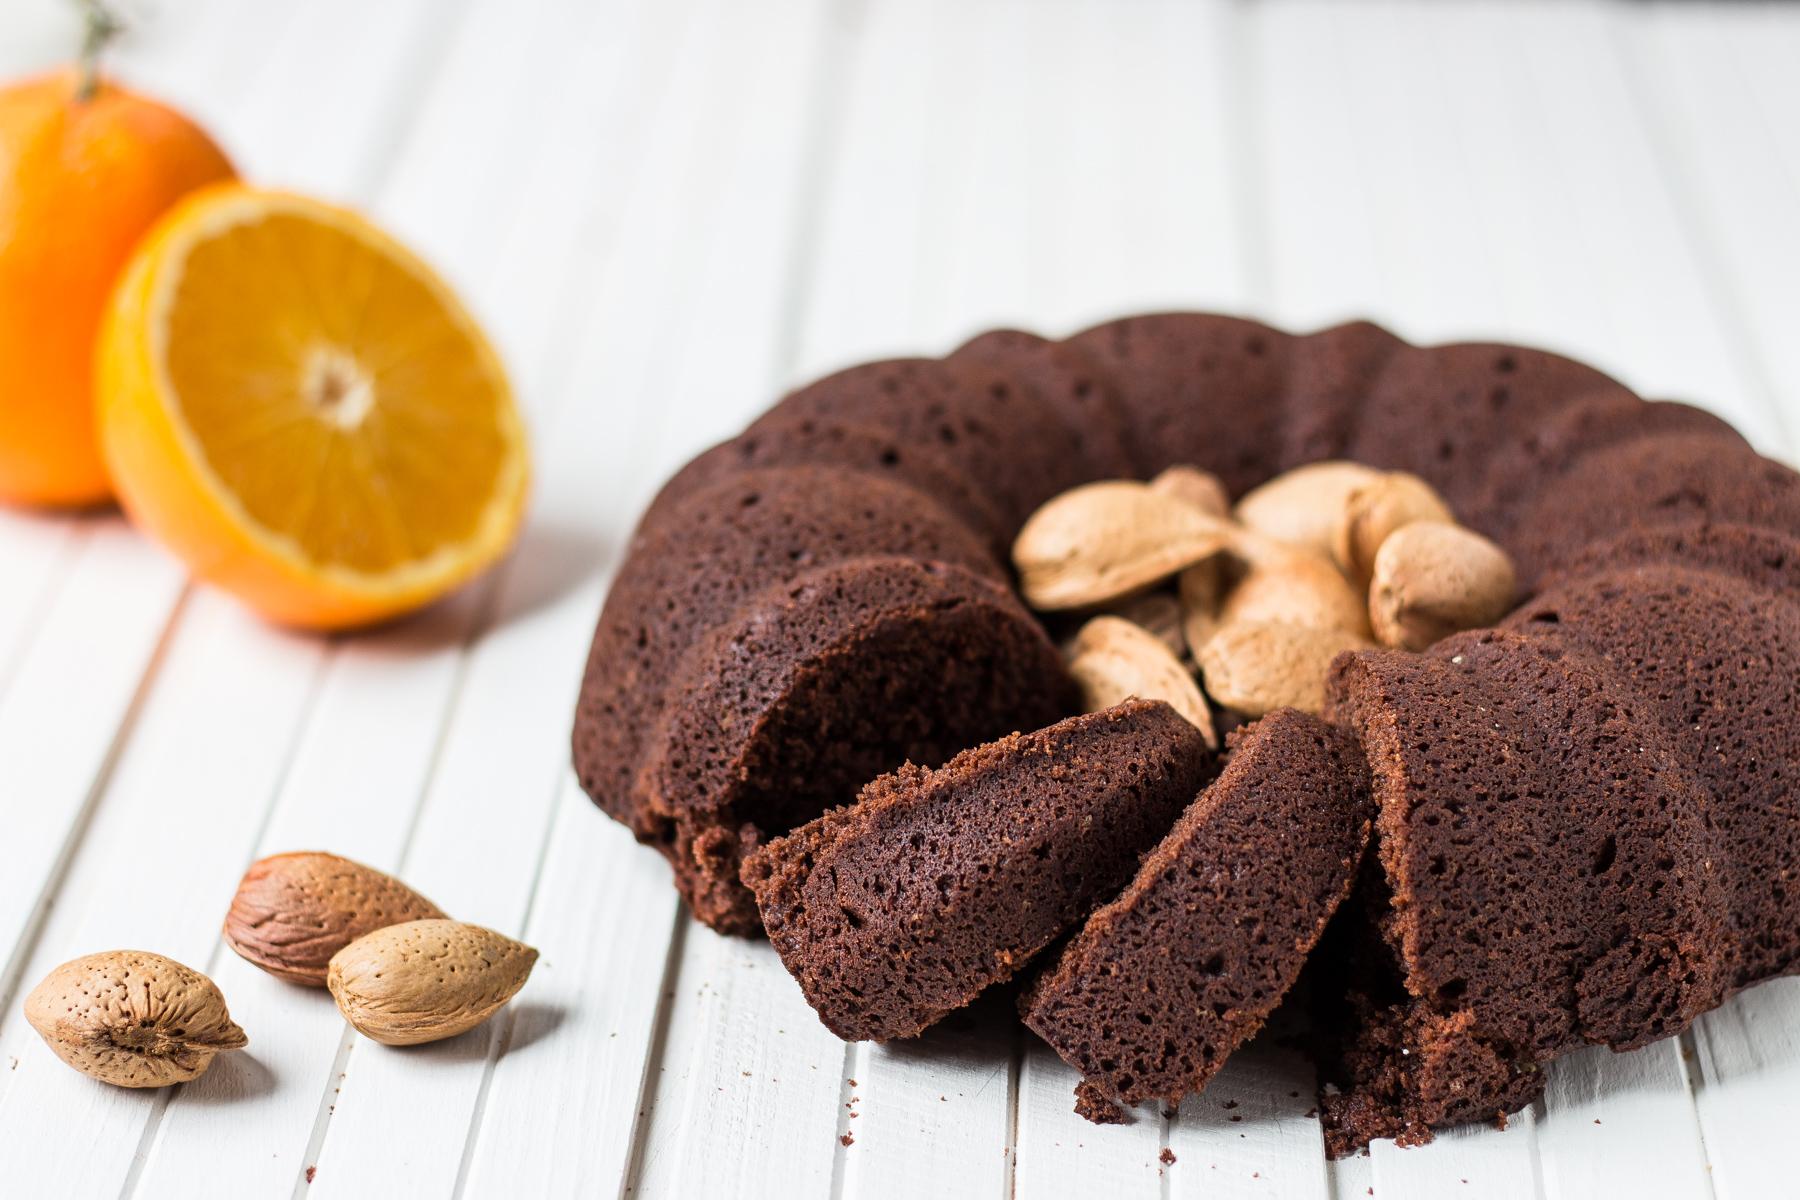 ciambella al cacao, mandorle e arancia